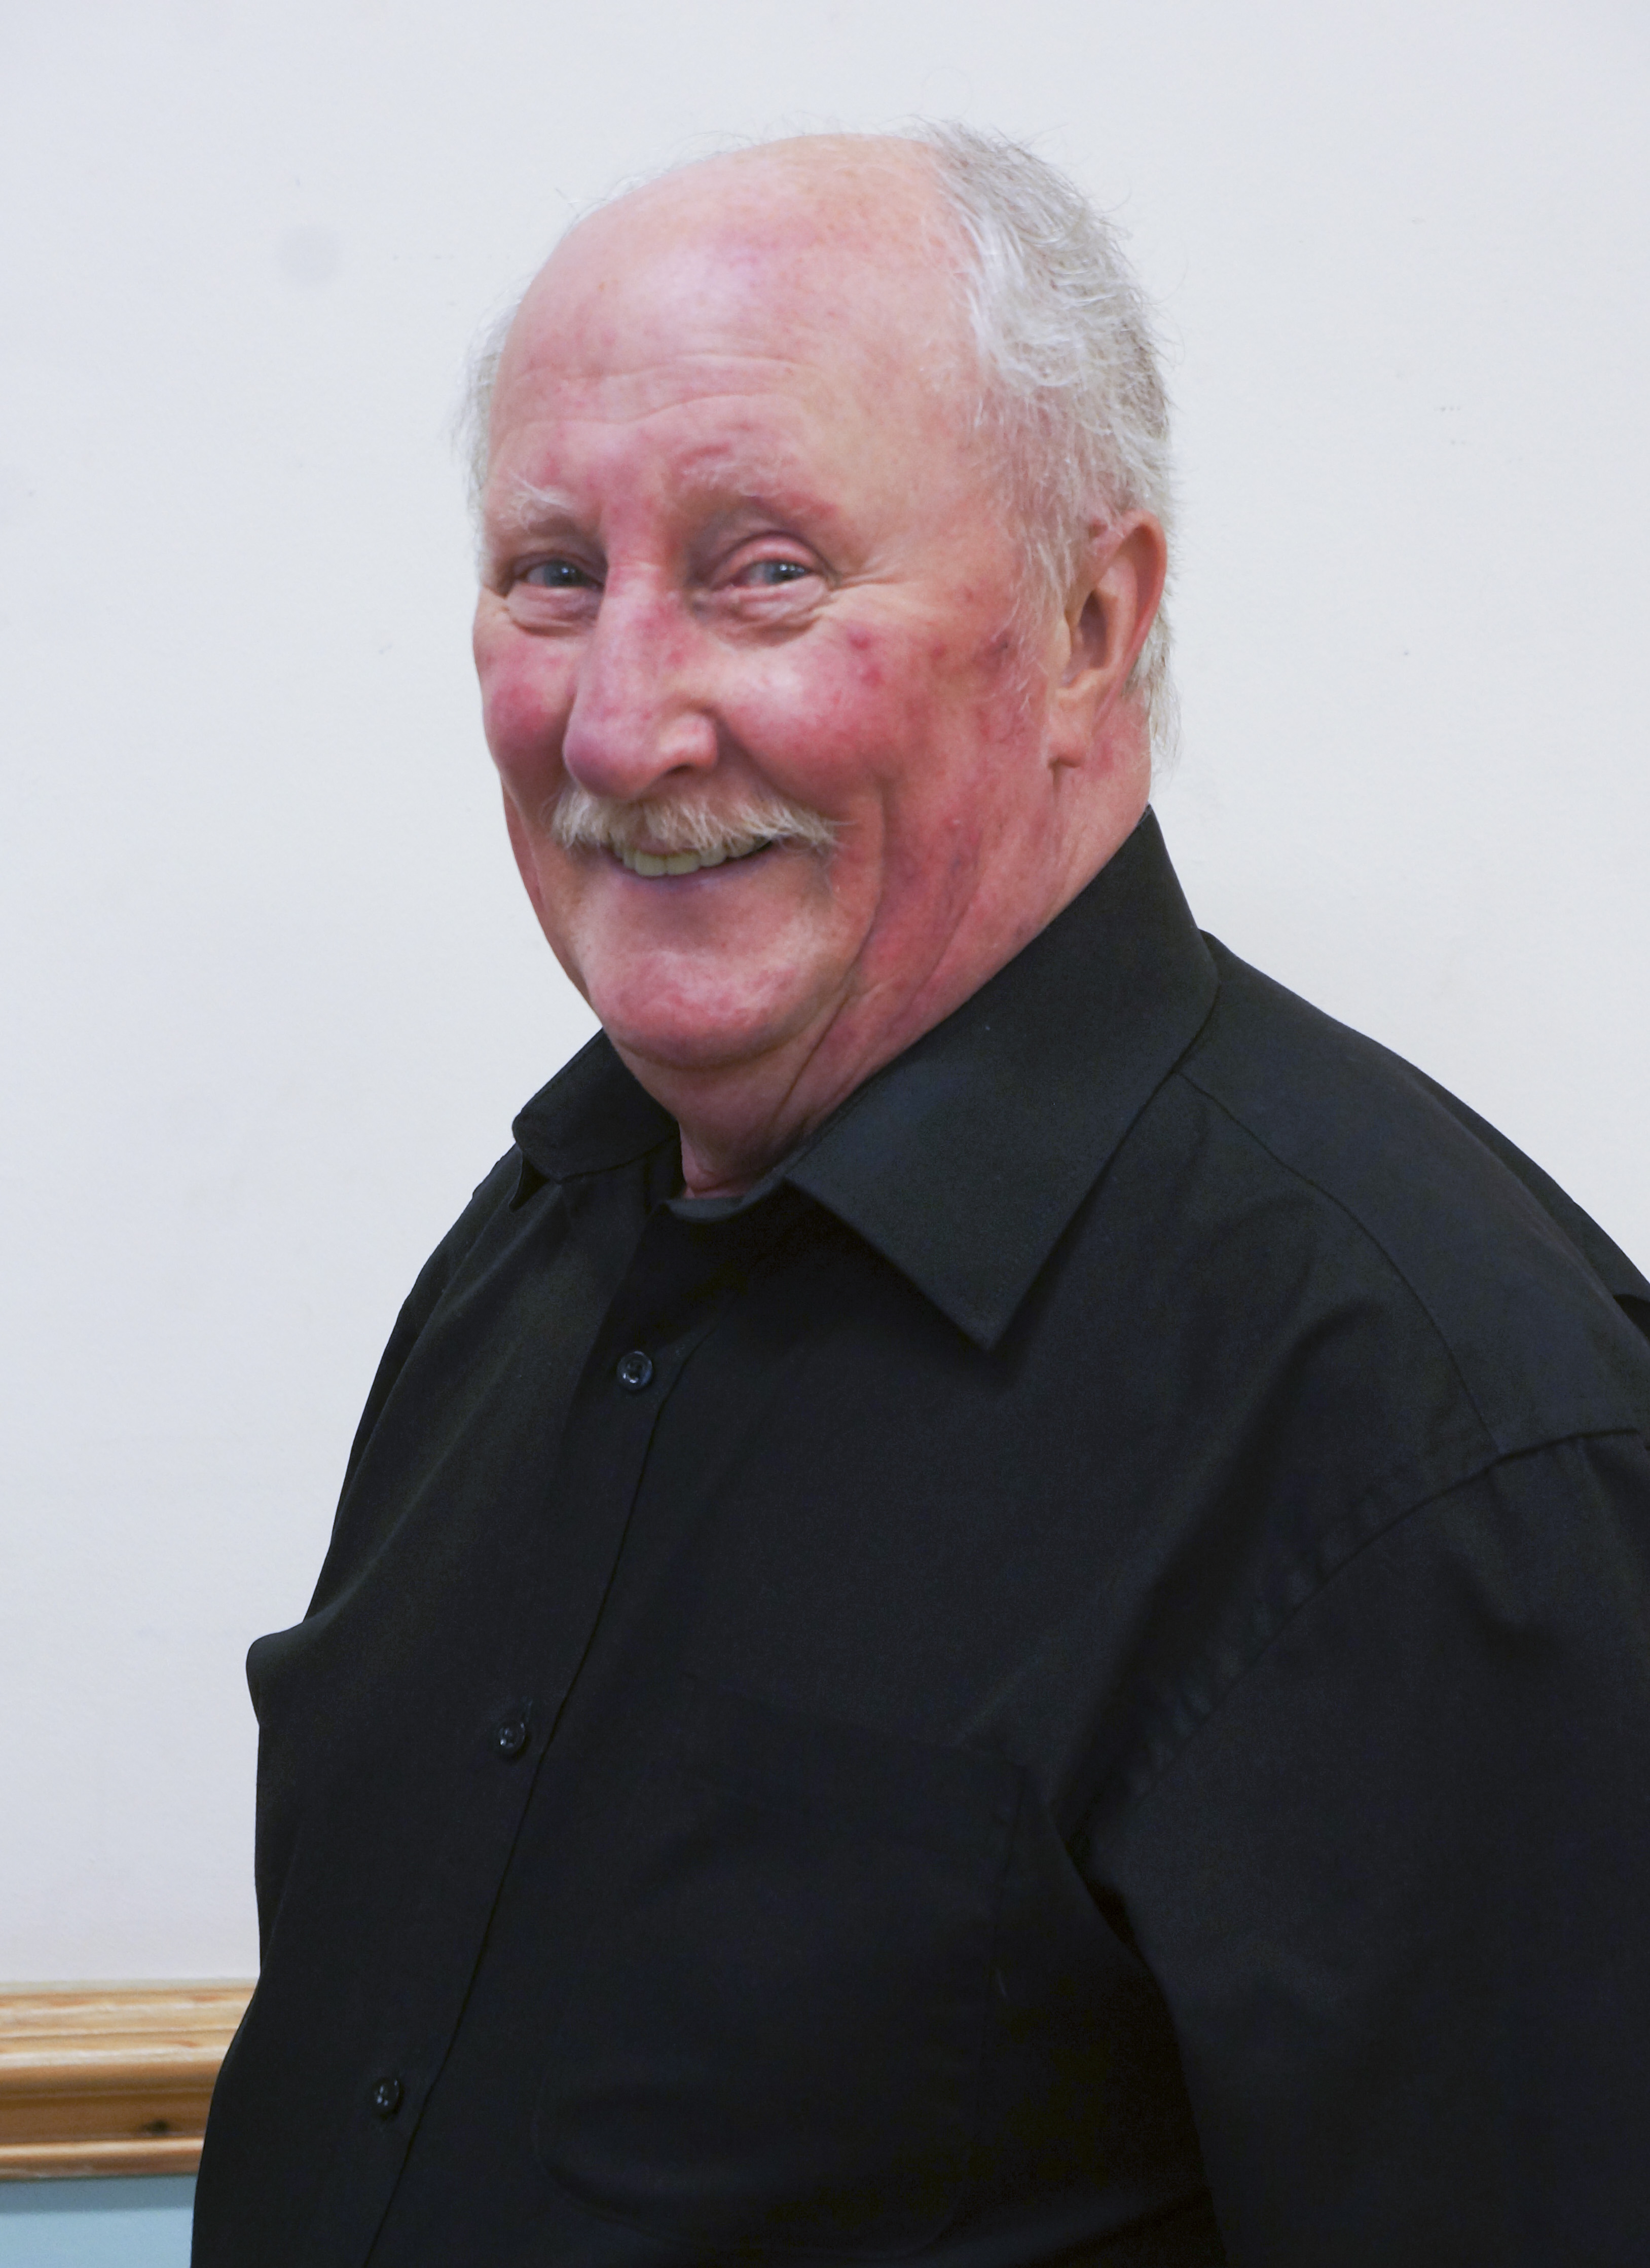 Geoff Pollard